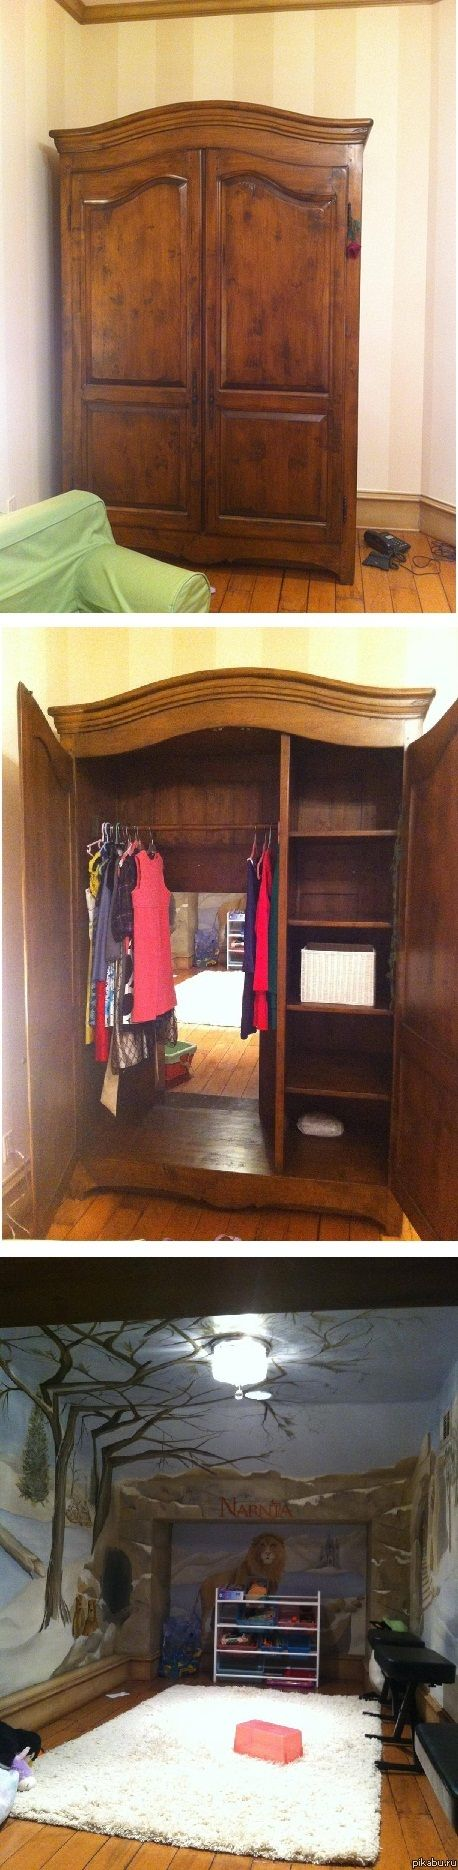 Narnia! Fabulous!Ideas, Play Rooms, Hidden Room, Kids Room, Dreams House, Playrooms, Plays Room, Narnia, Secret Rooms